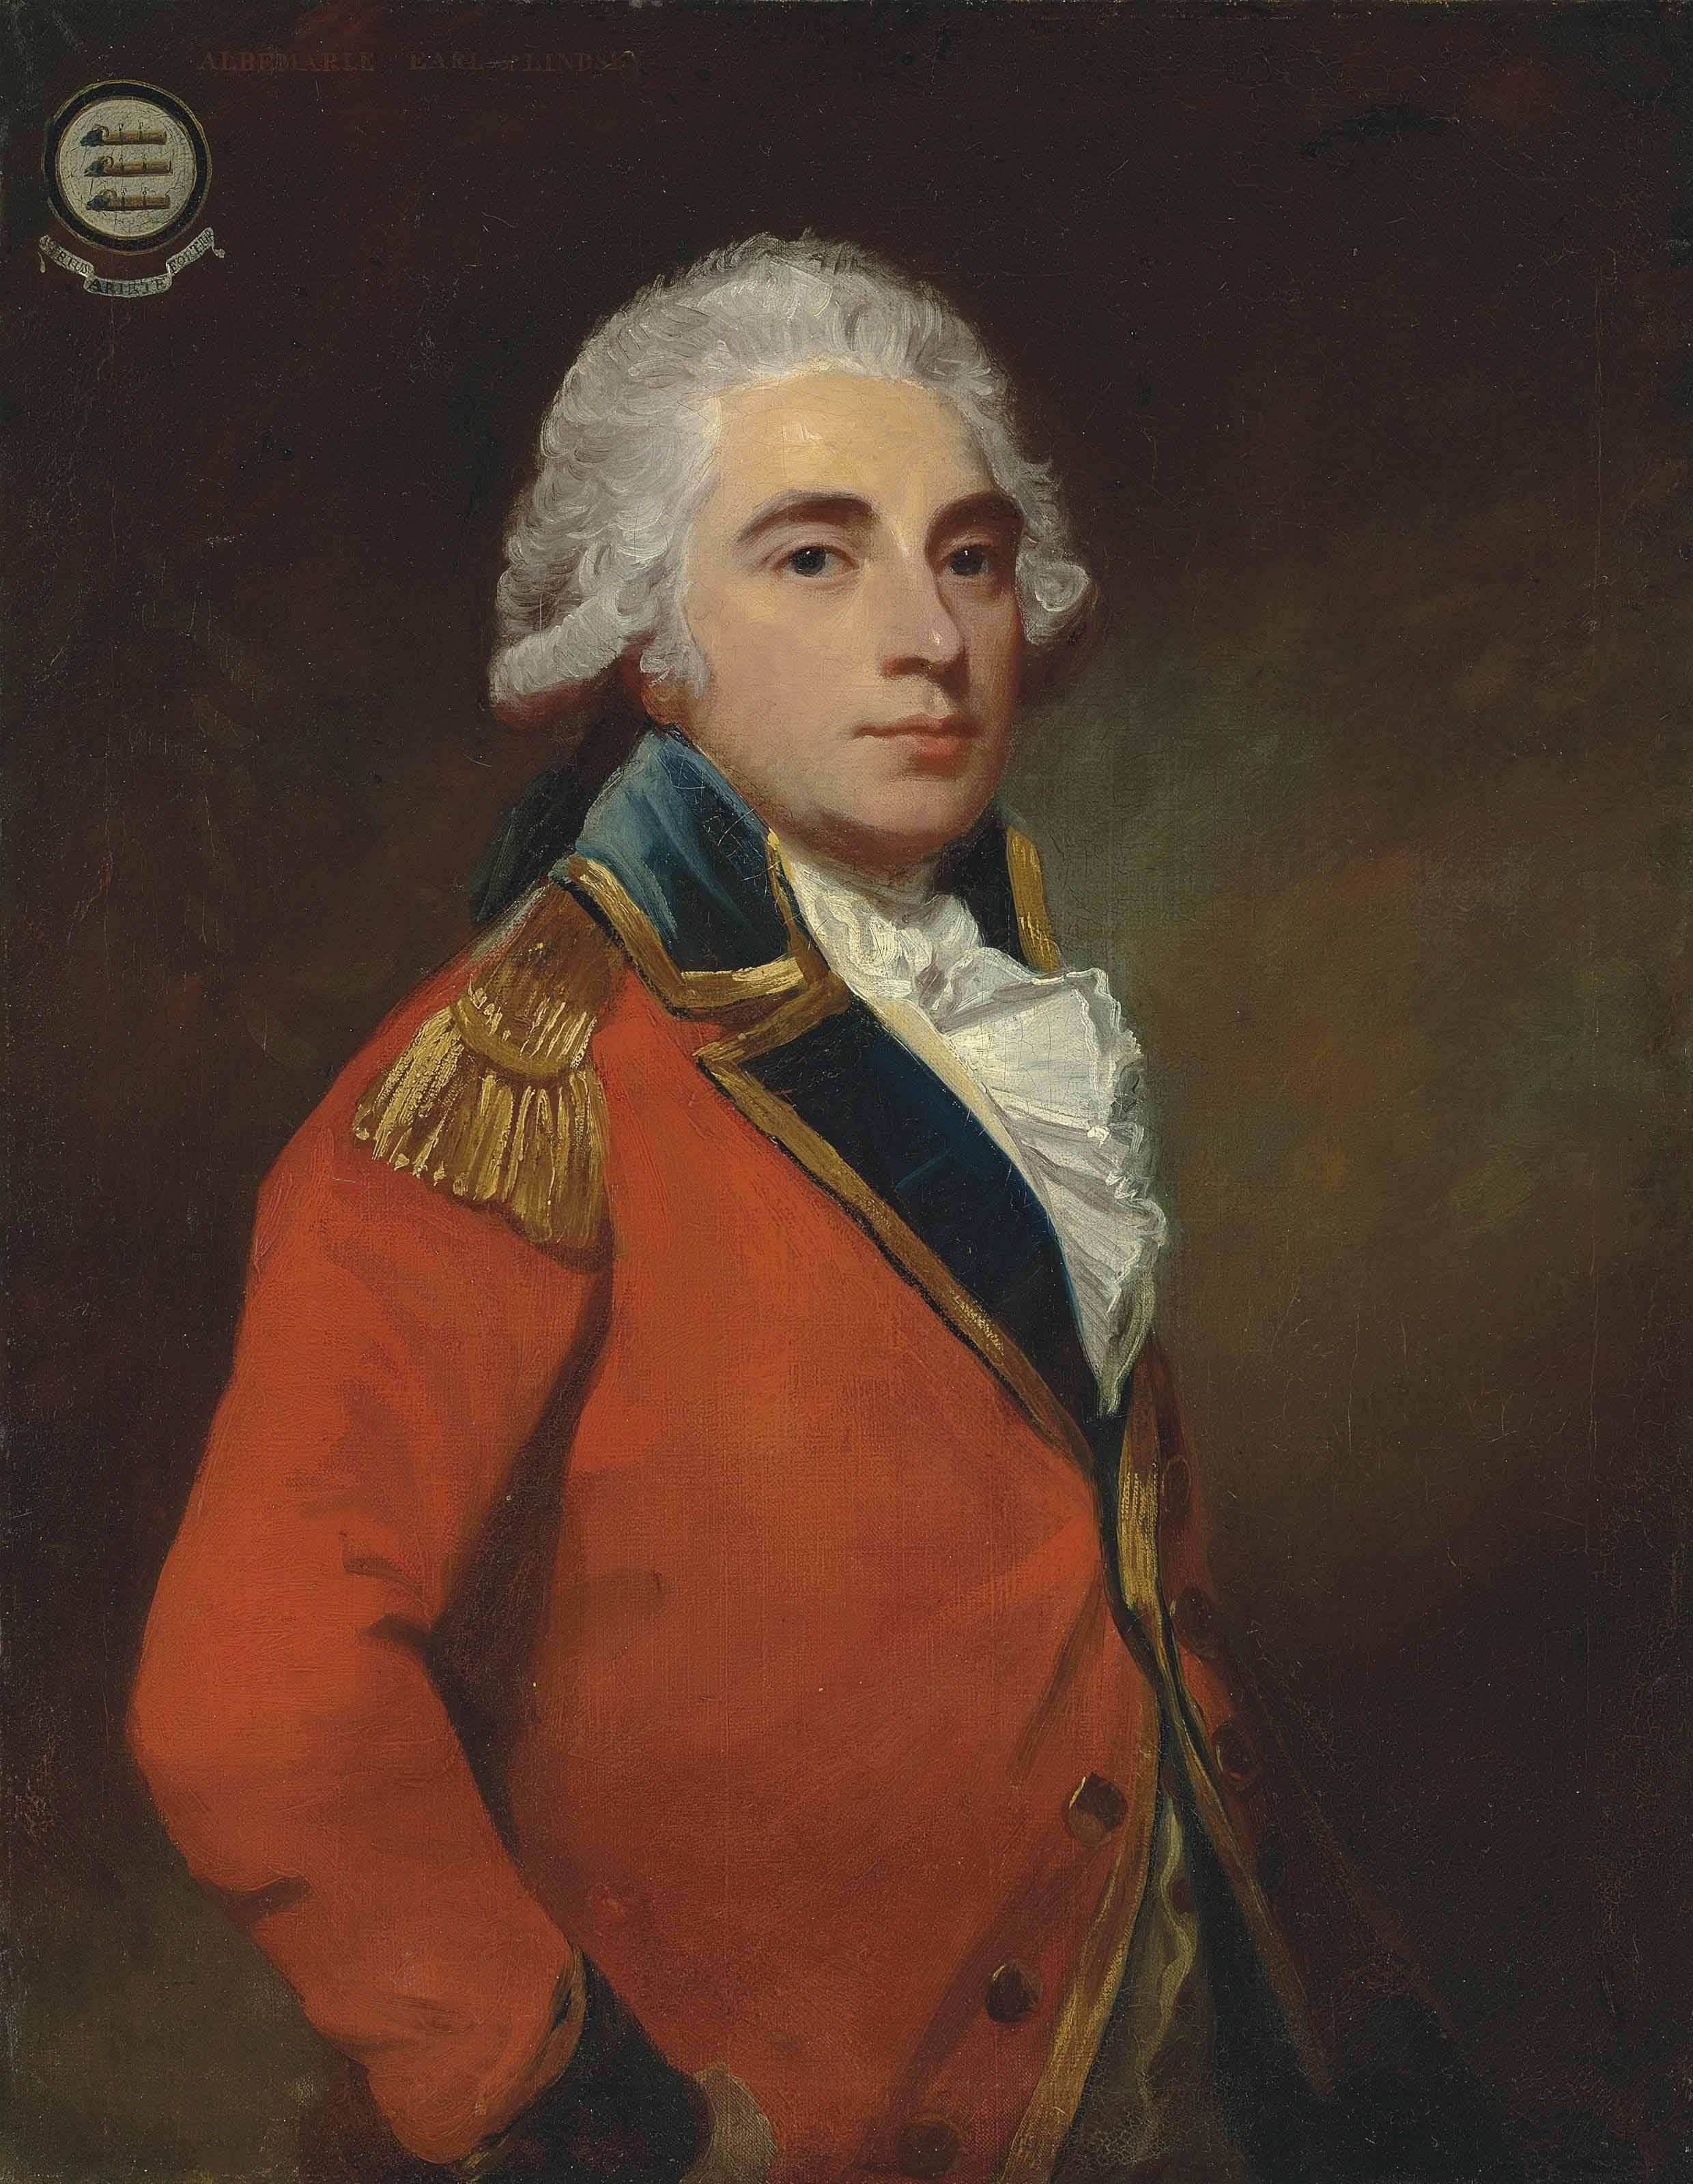 Portrait of General Albemarle Bertie, 9th Earl of Lindsay (1744-1818), half-length, in the uniform of the Grenadier guards